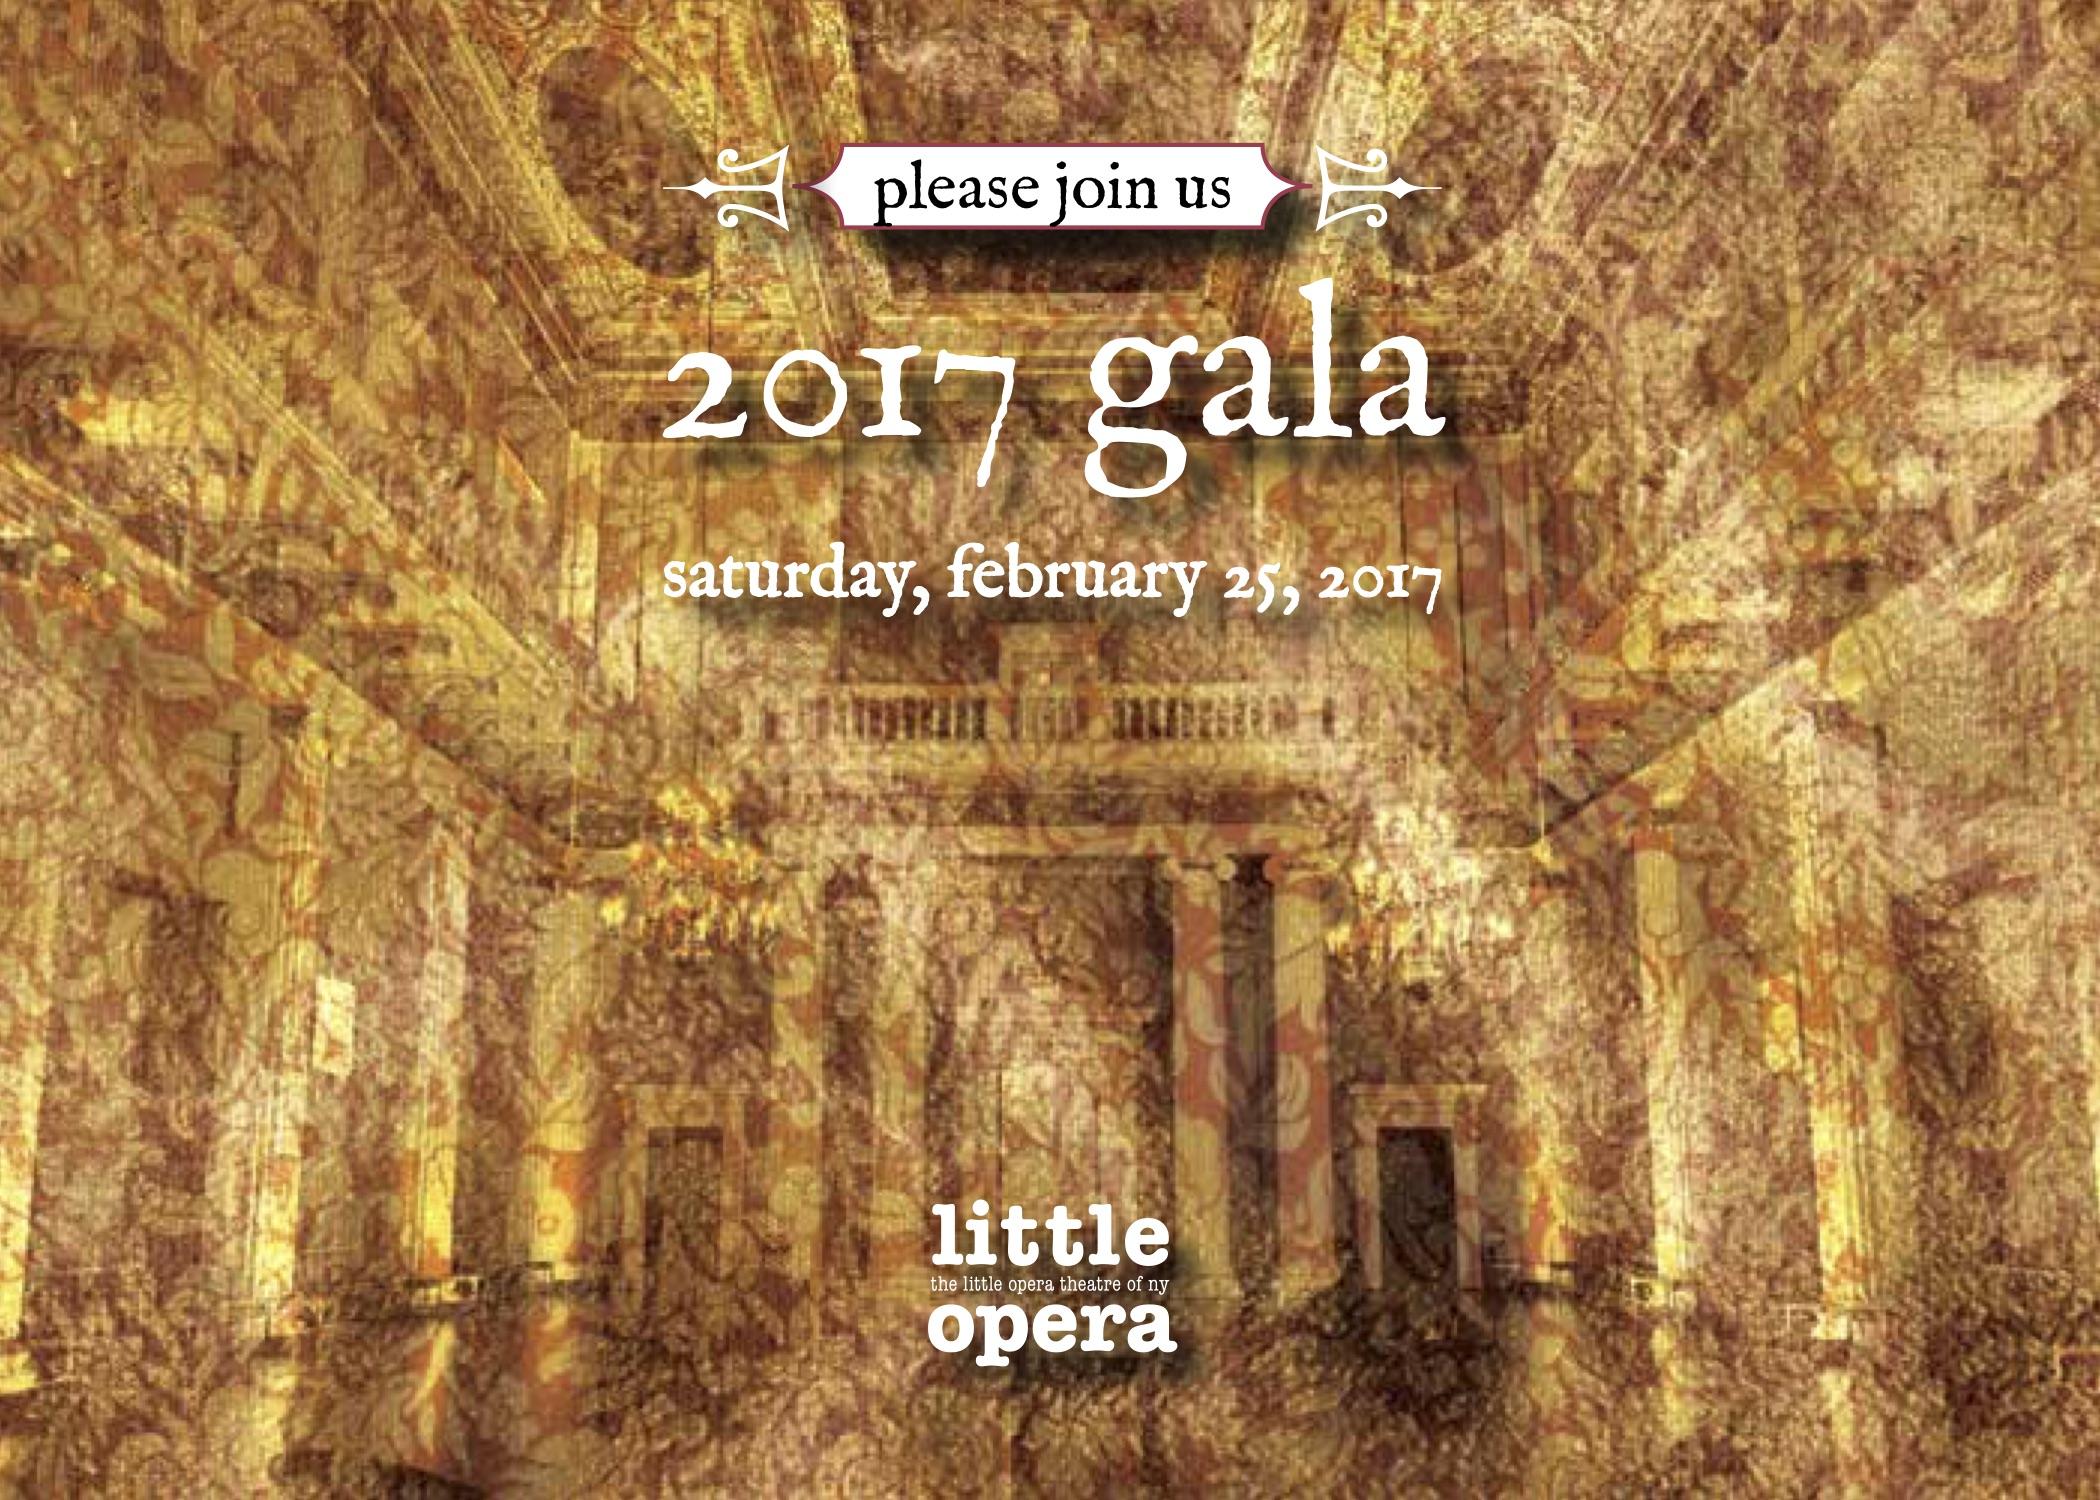 2017 Gala - Saturday, February 25, 2017583 Park Avenue